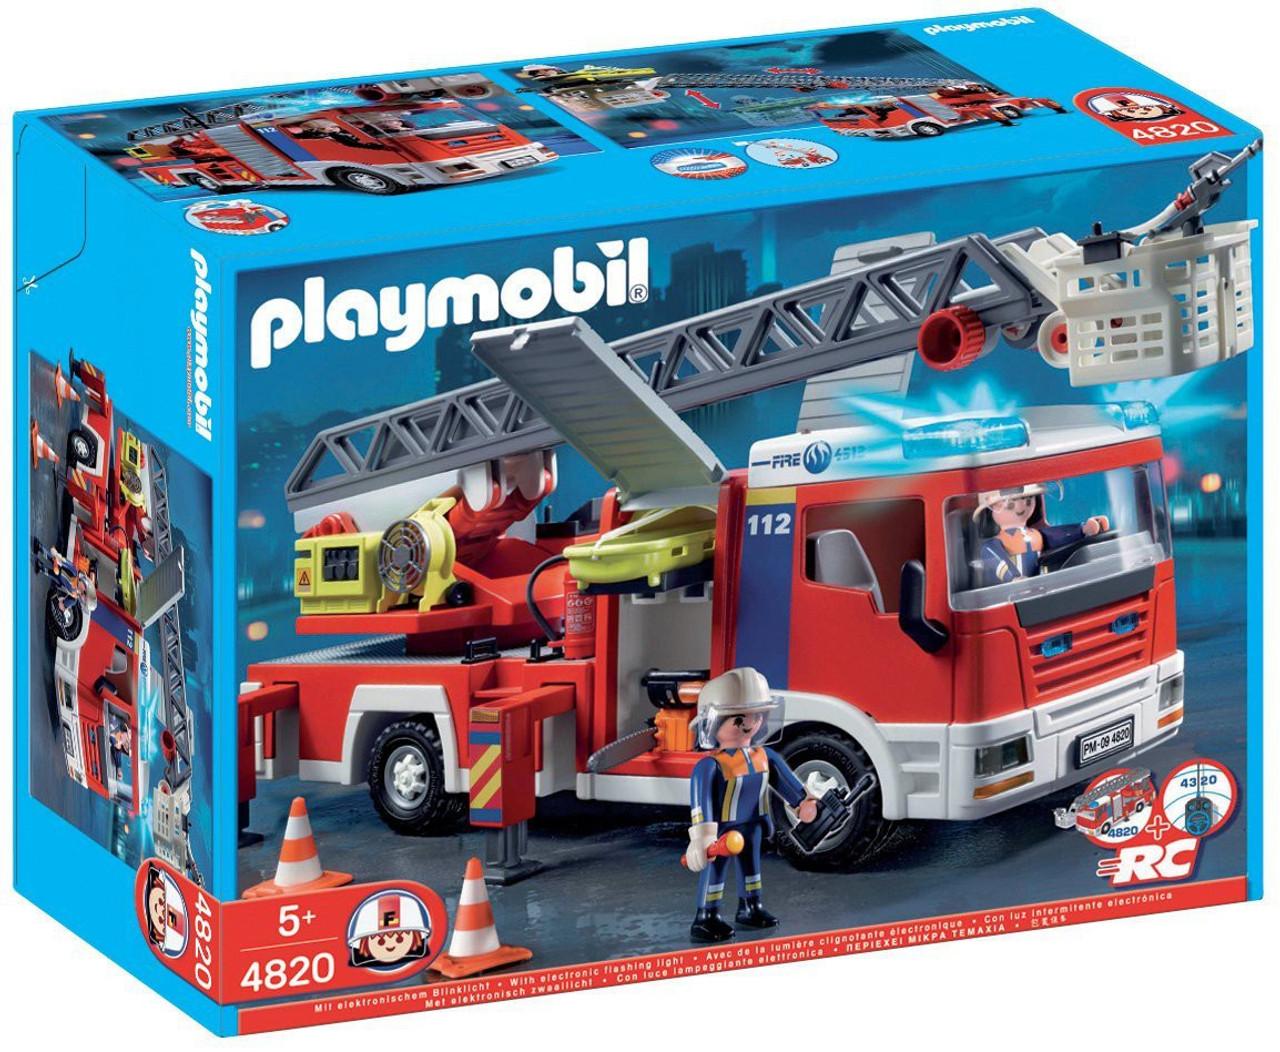 Playmobil Rescue Ladder Unit Set #4820